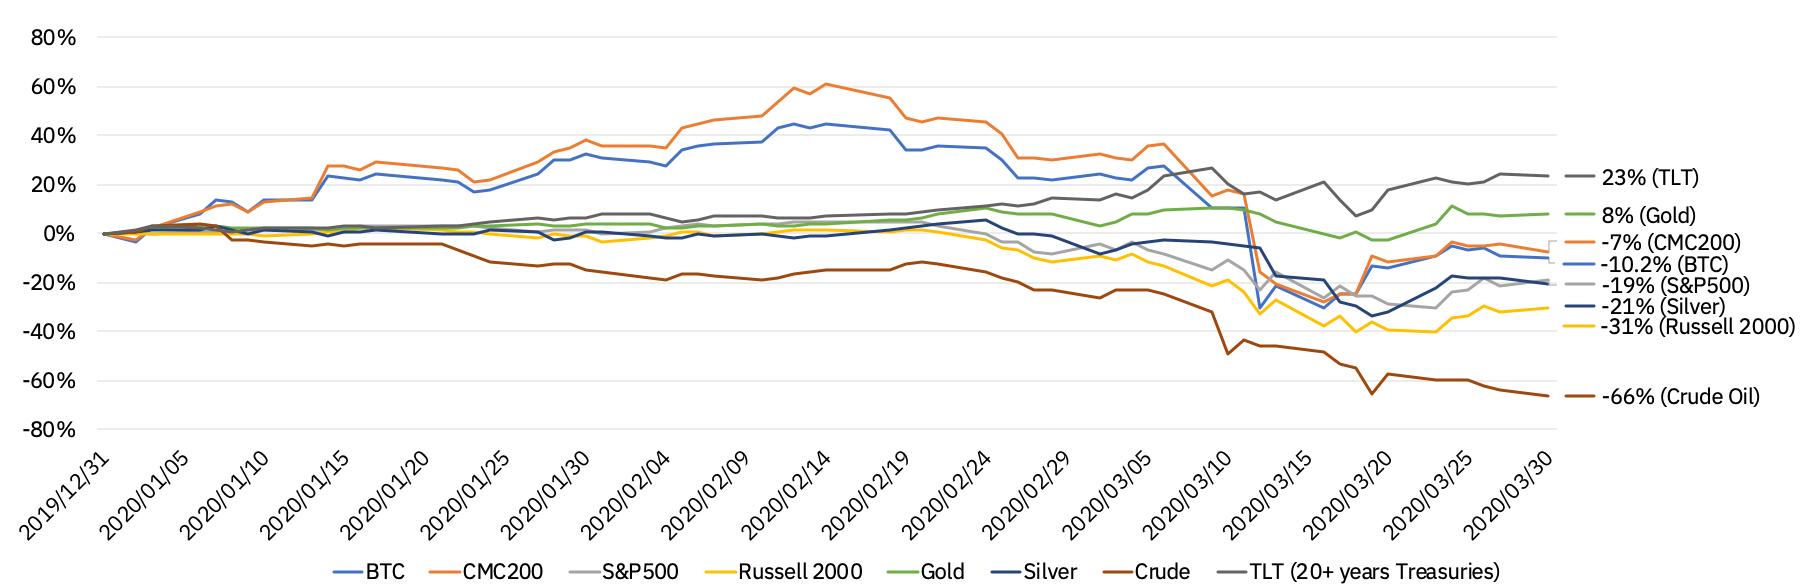 quarterly performance financial assets Q1 2020